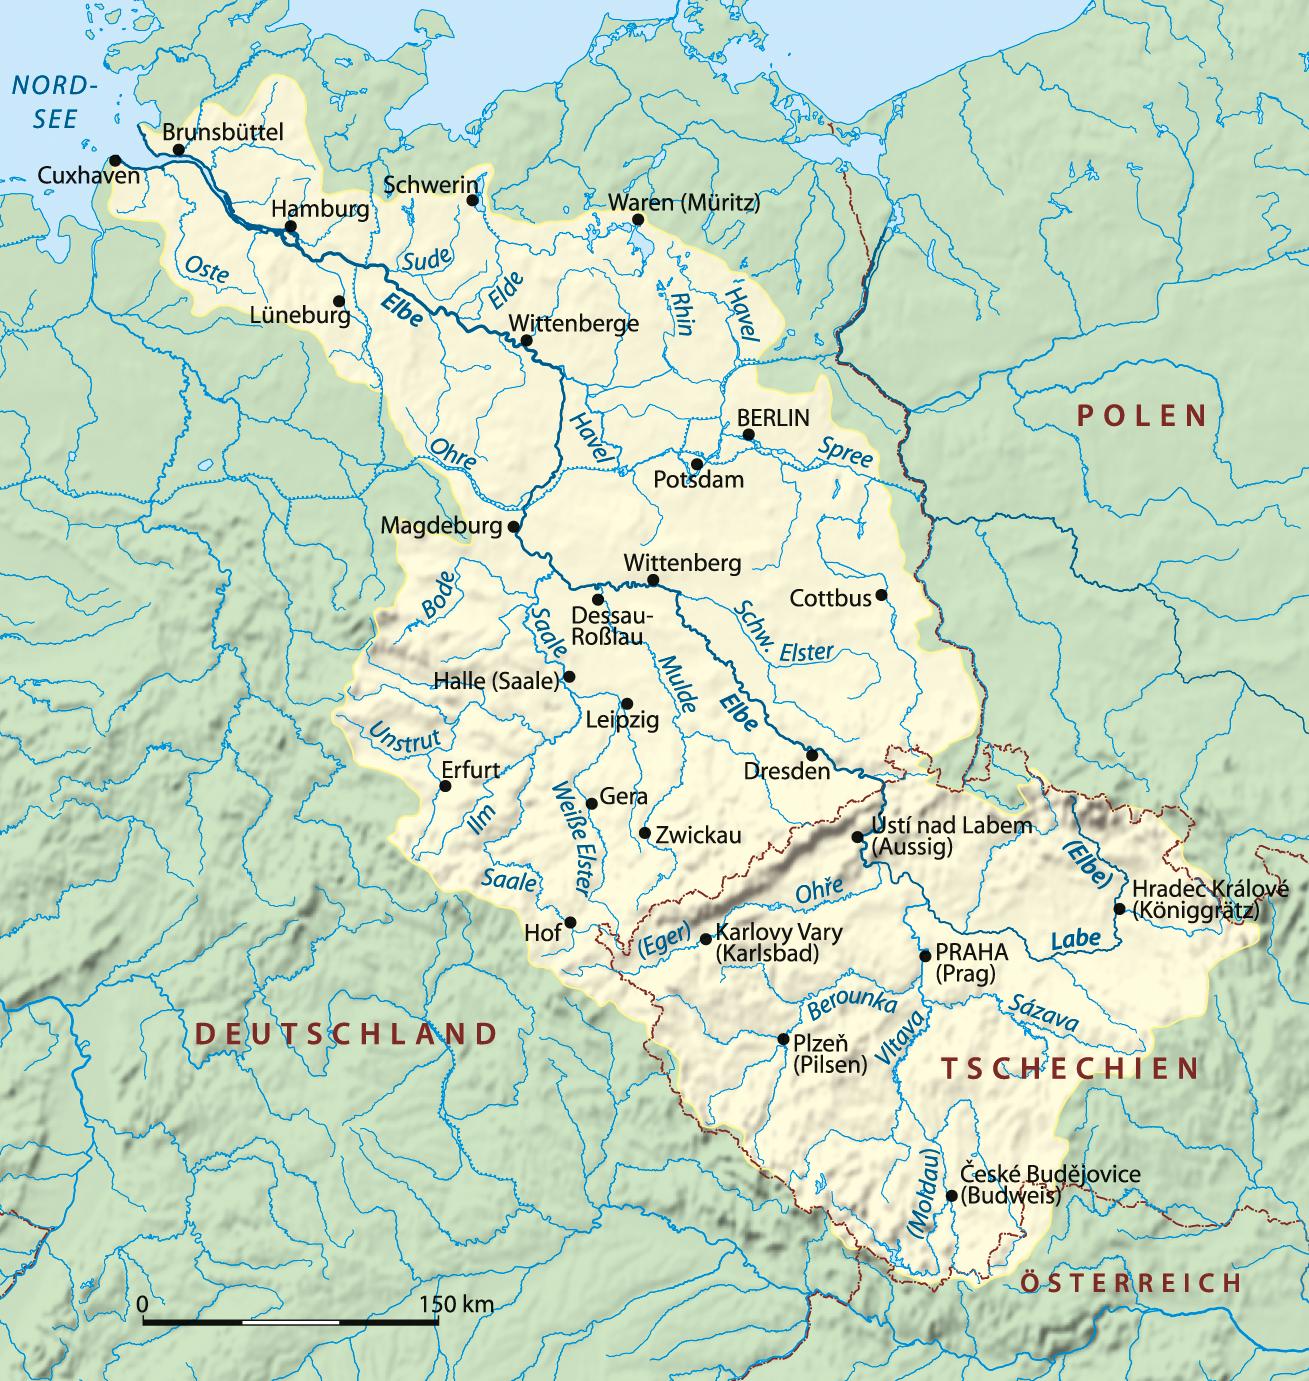 Wikipedia:Auskunft/Archiv/2013/Woche 23 – Wikipedia